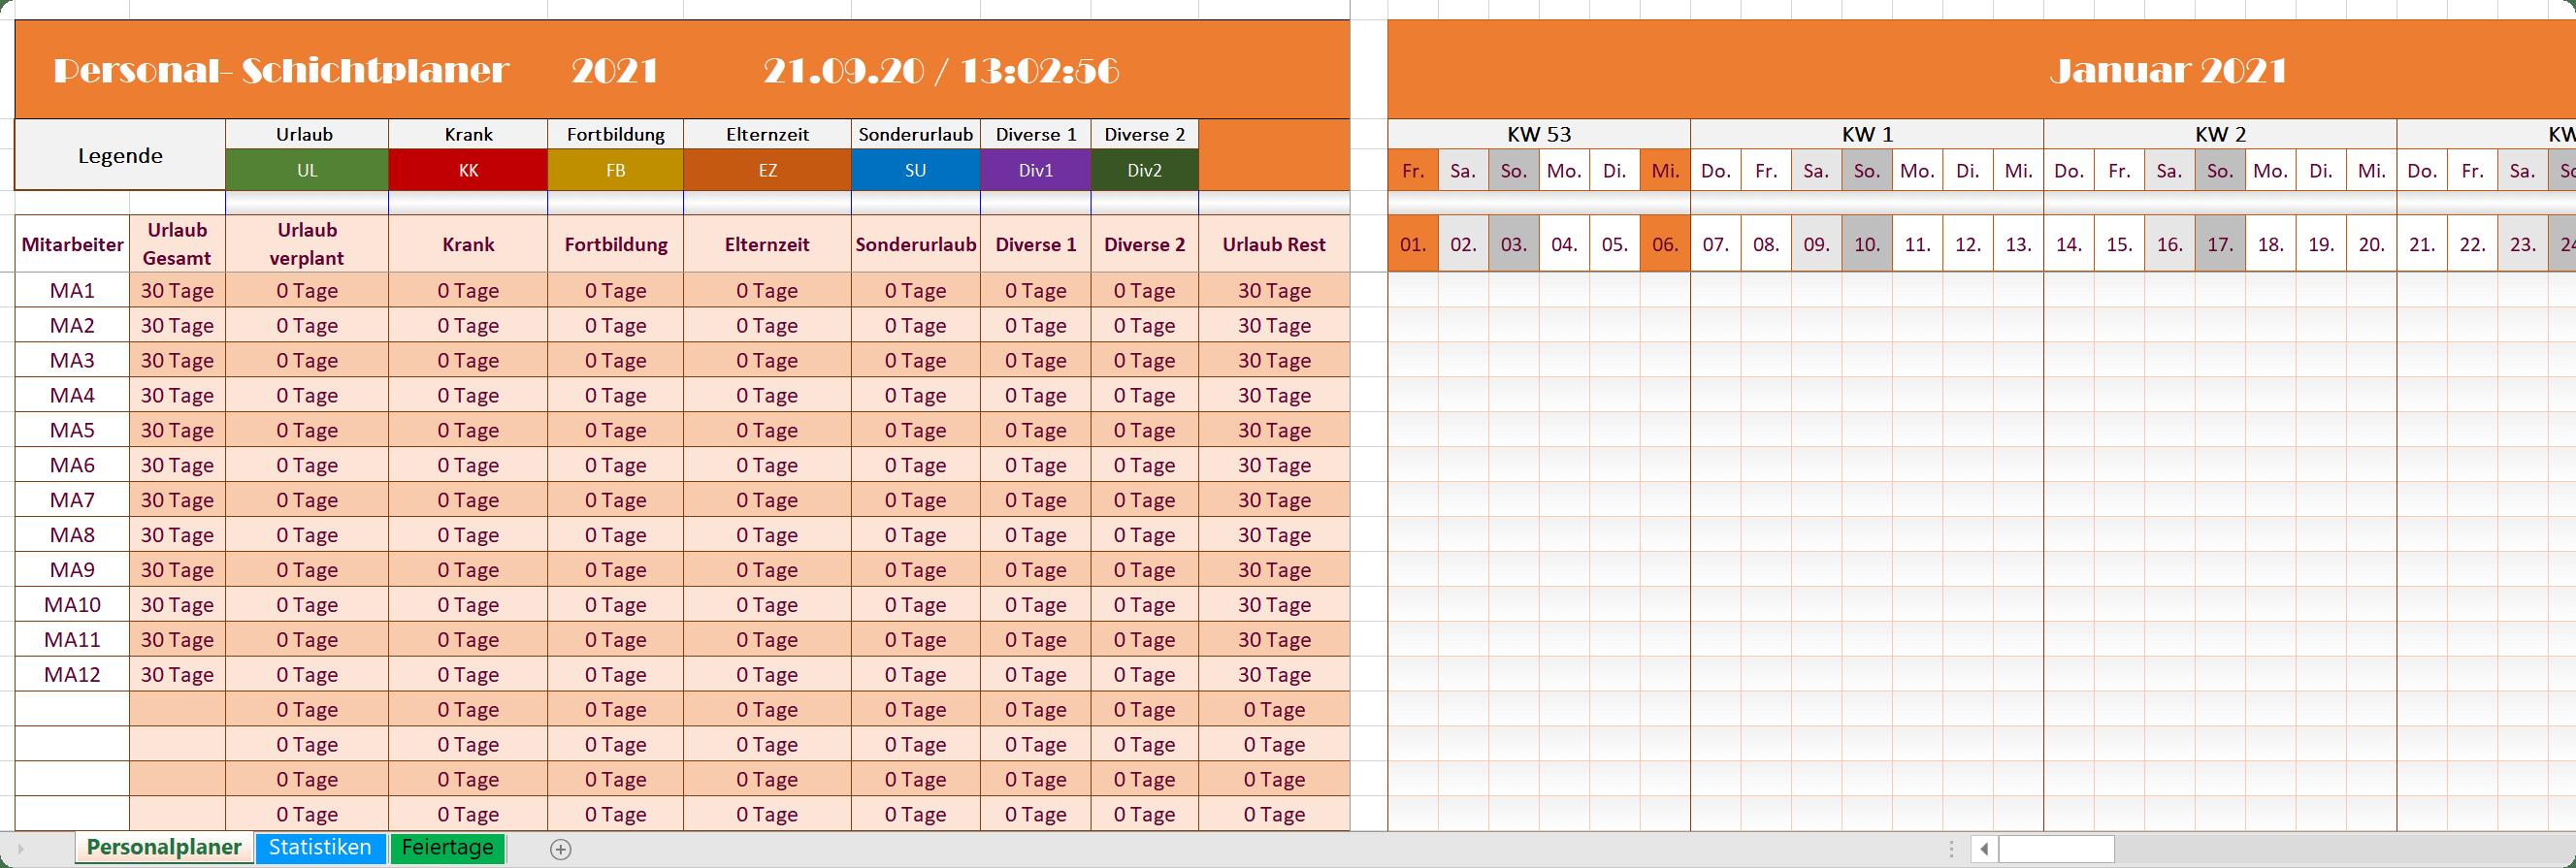 Excel Personalplaner 2021 - Orange